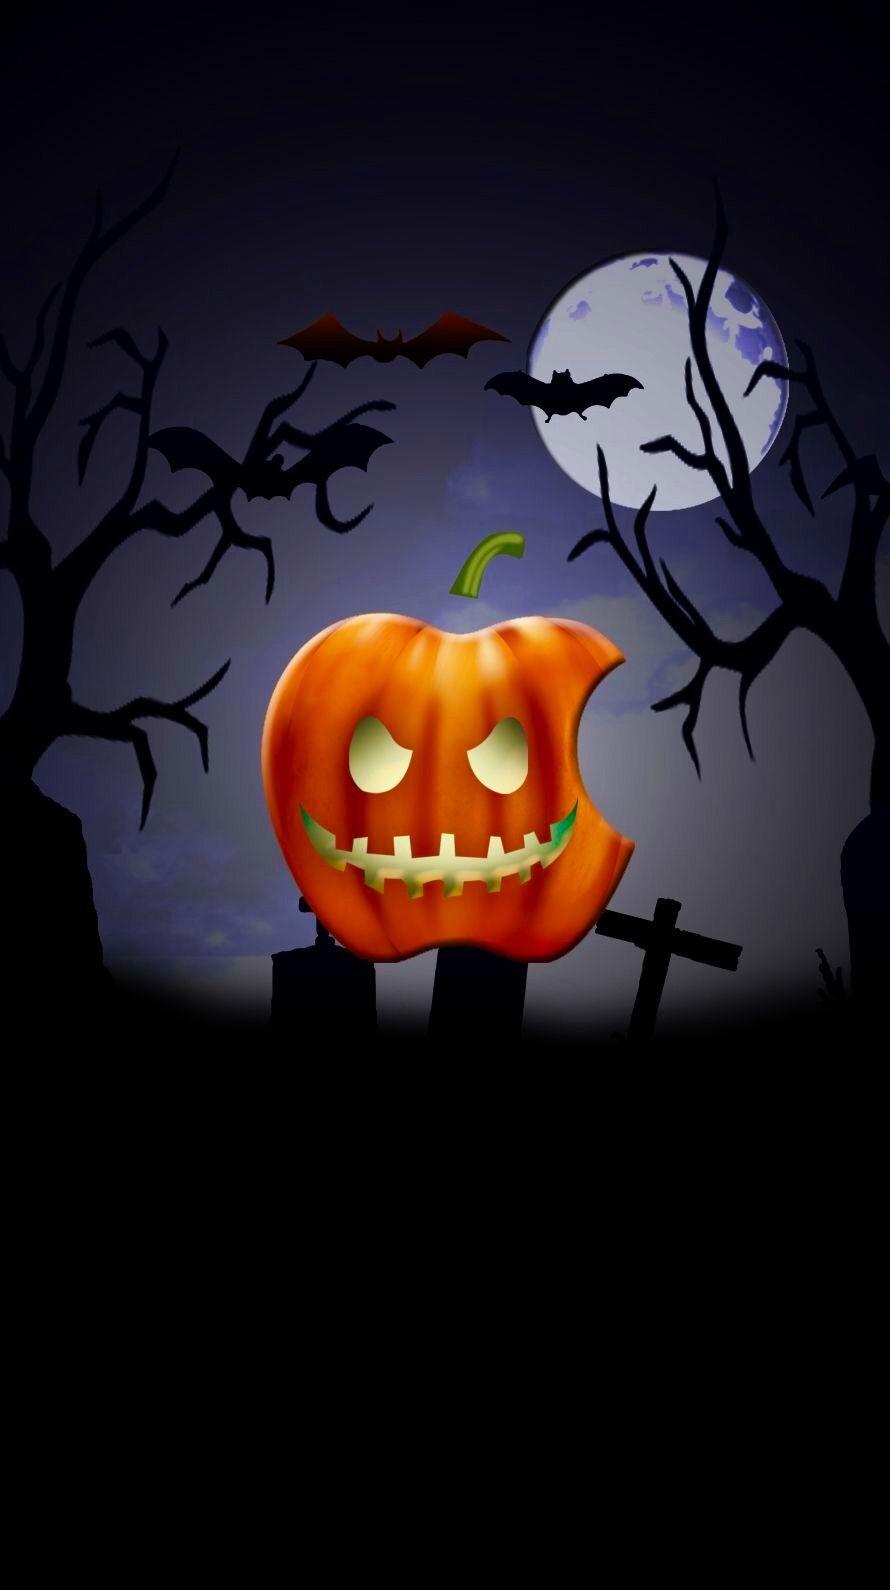 Jack O Lantern Apple Apple Logo Wallpaper Android Wallpaper Apple Wallpaper Iphone